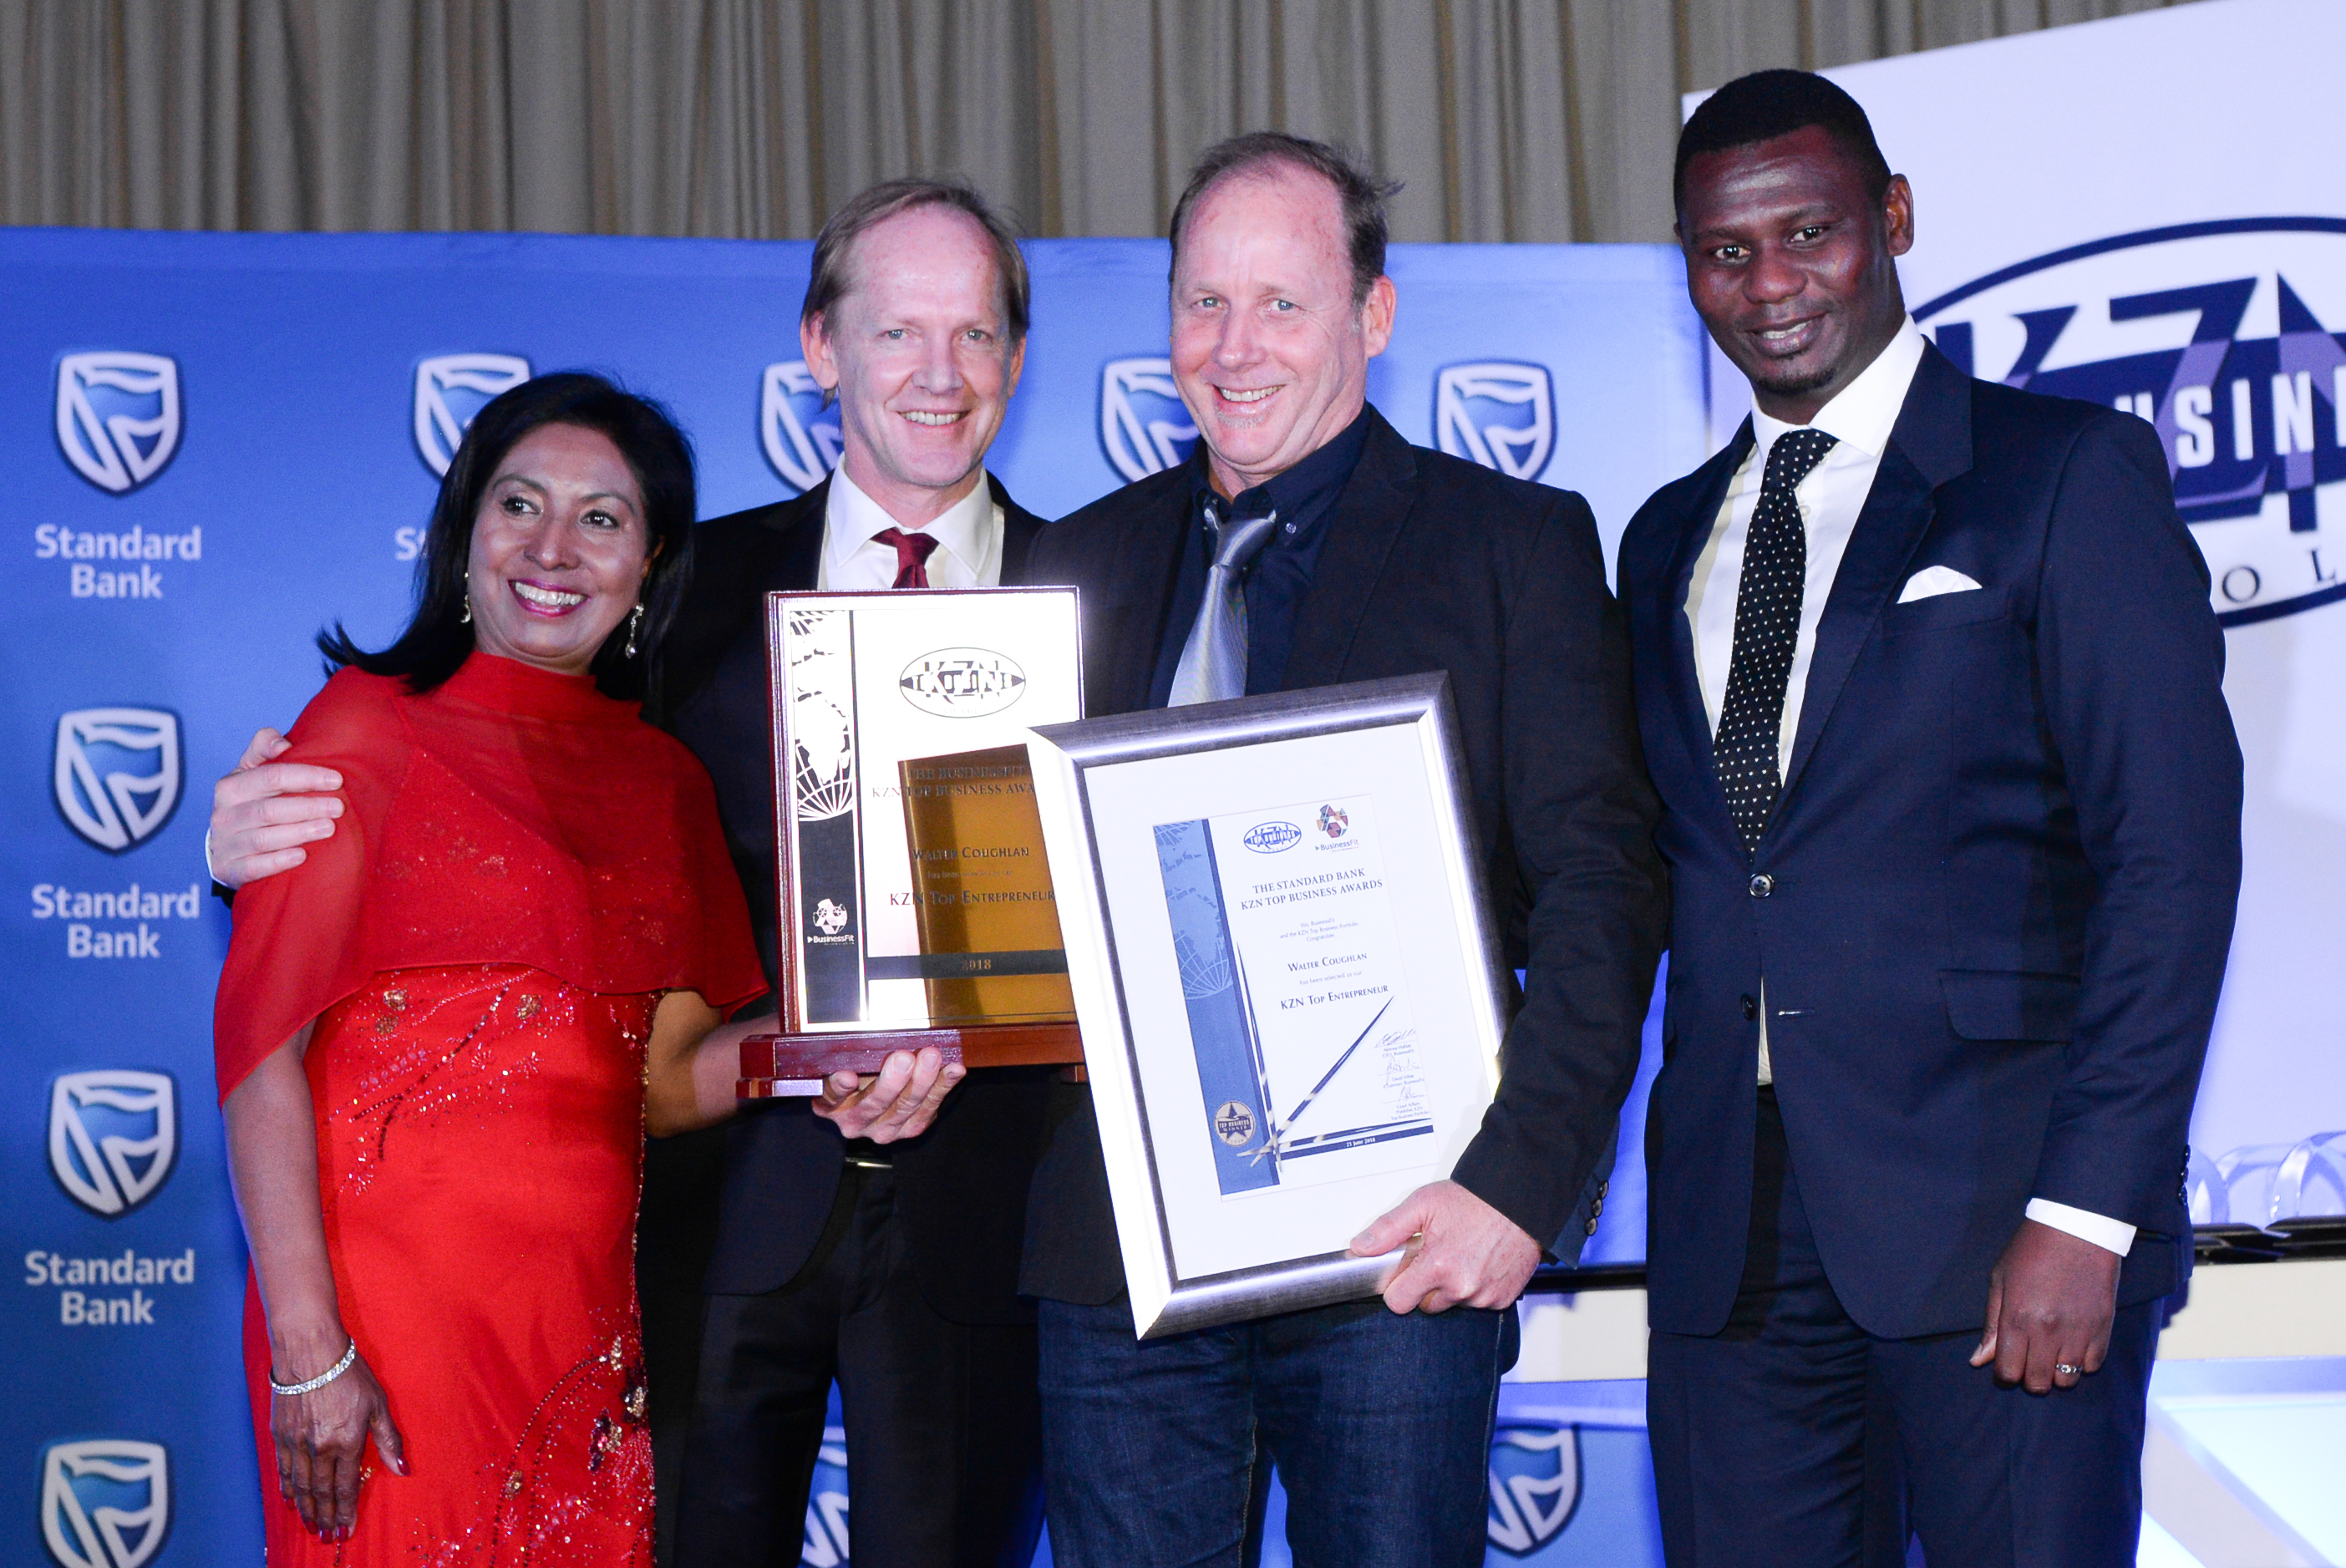 KZN Top Business Awards